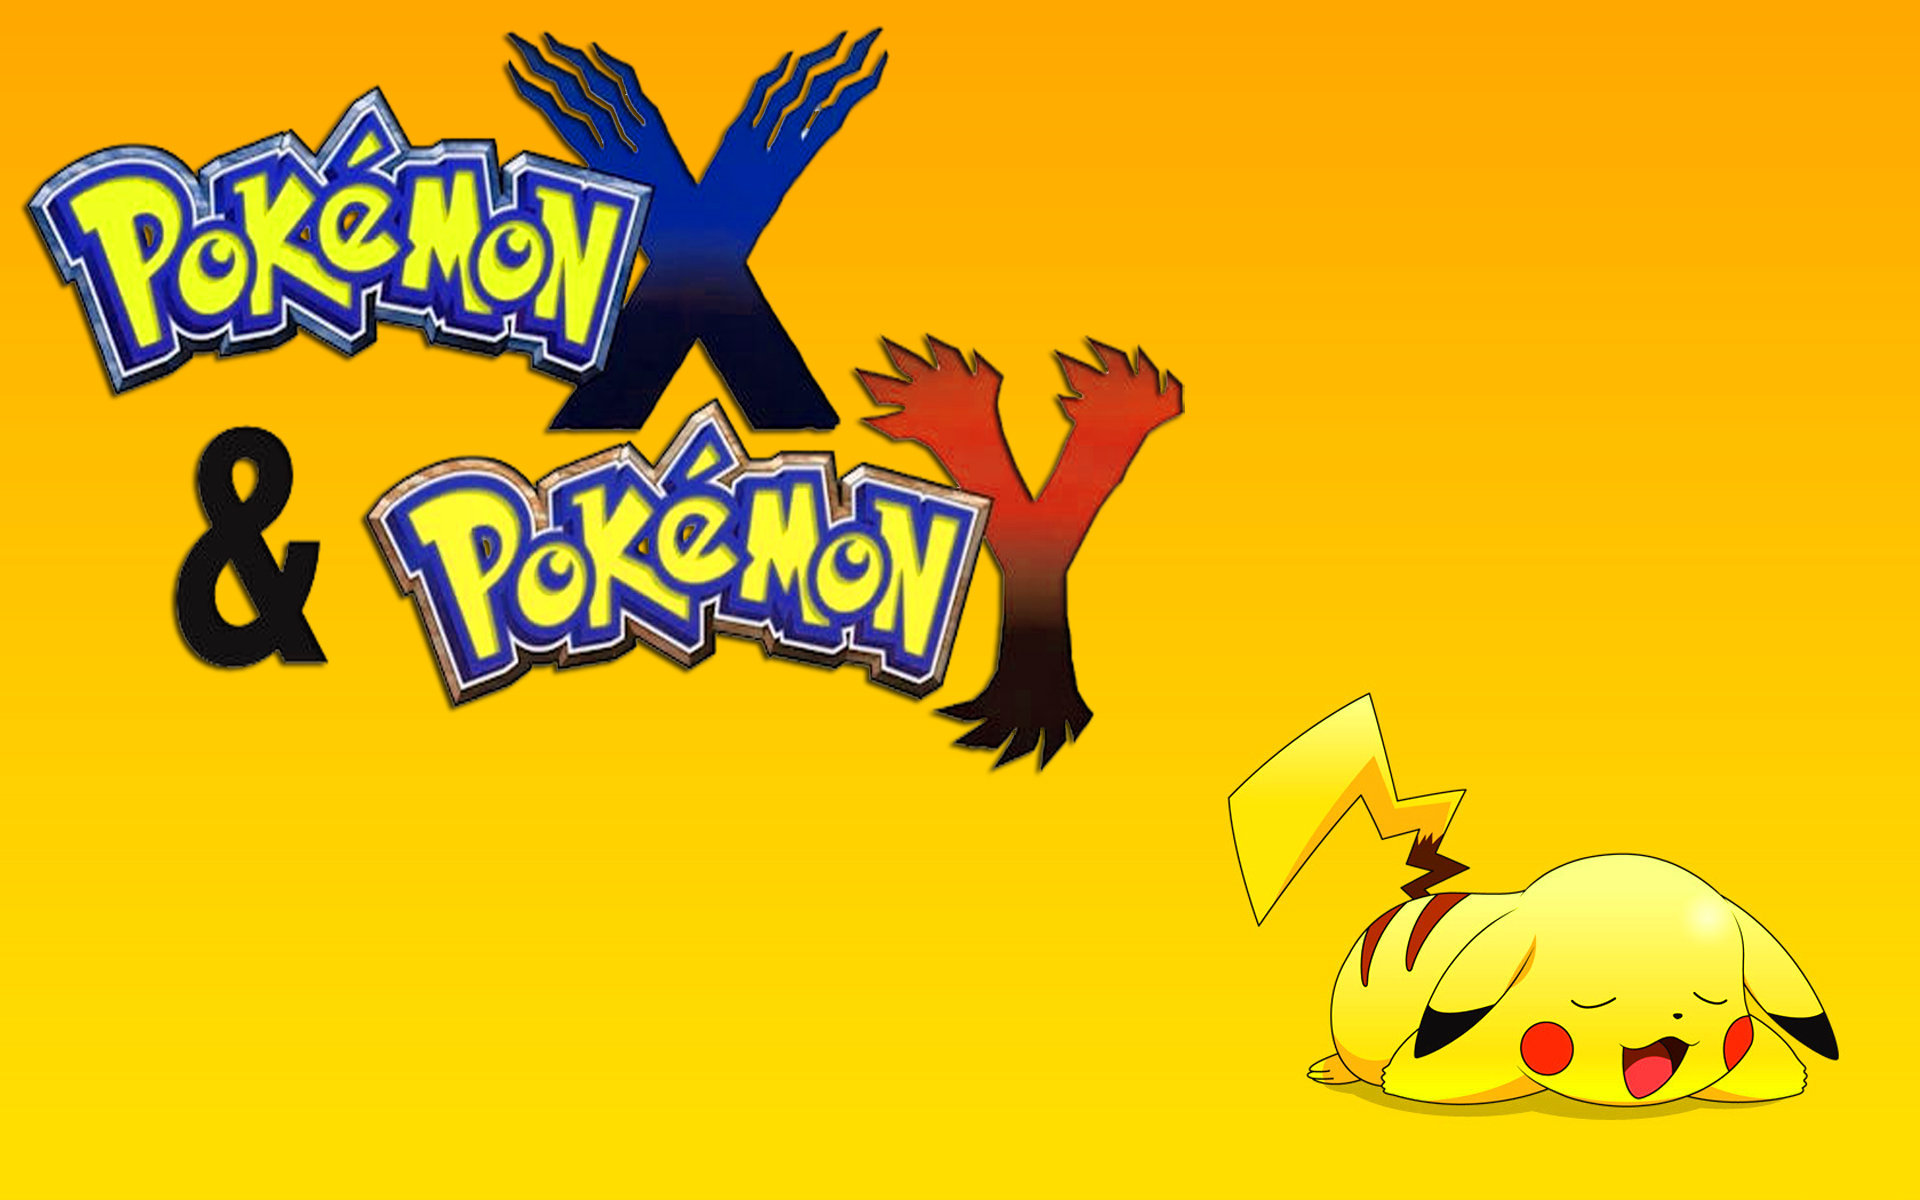 Pokemon X And Y Dektop Wallpapers 1920x1200